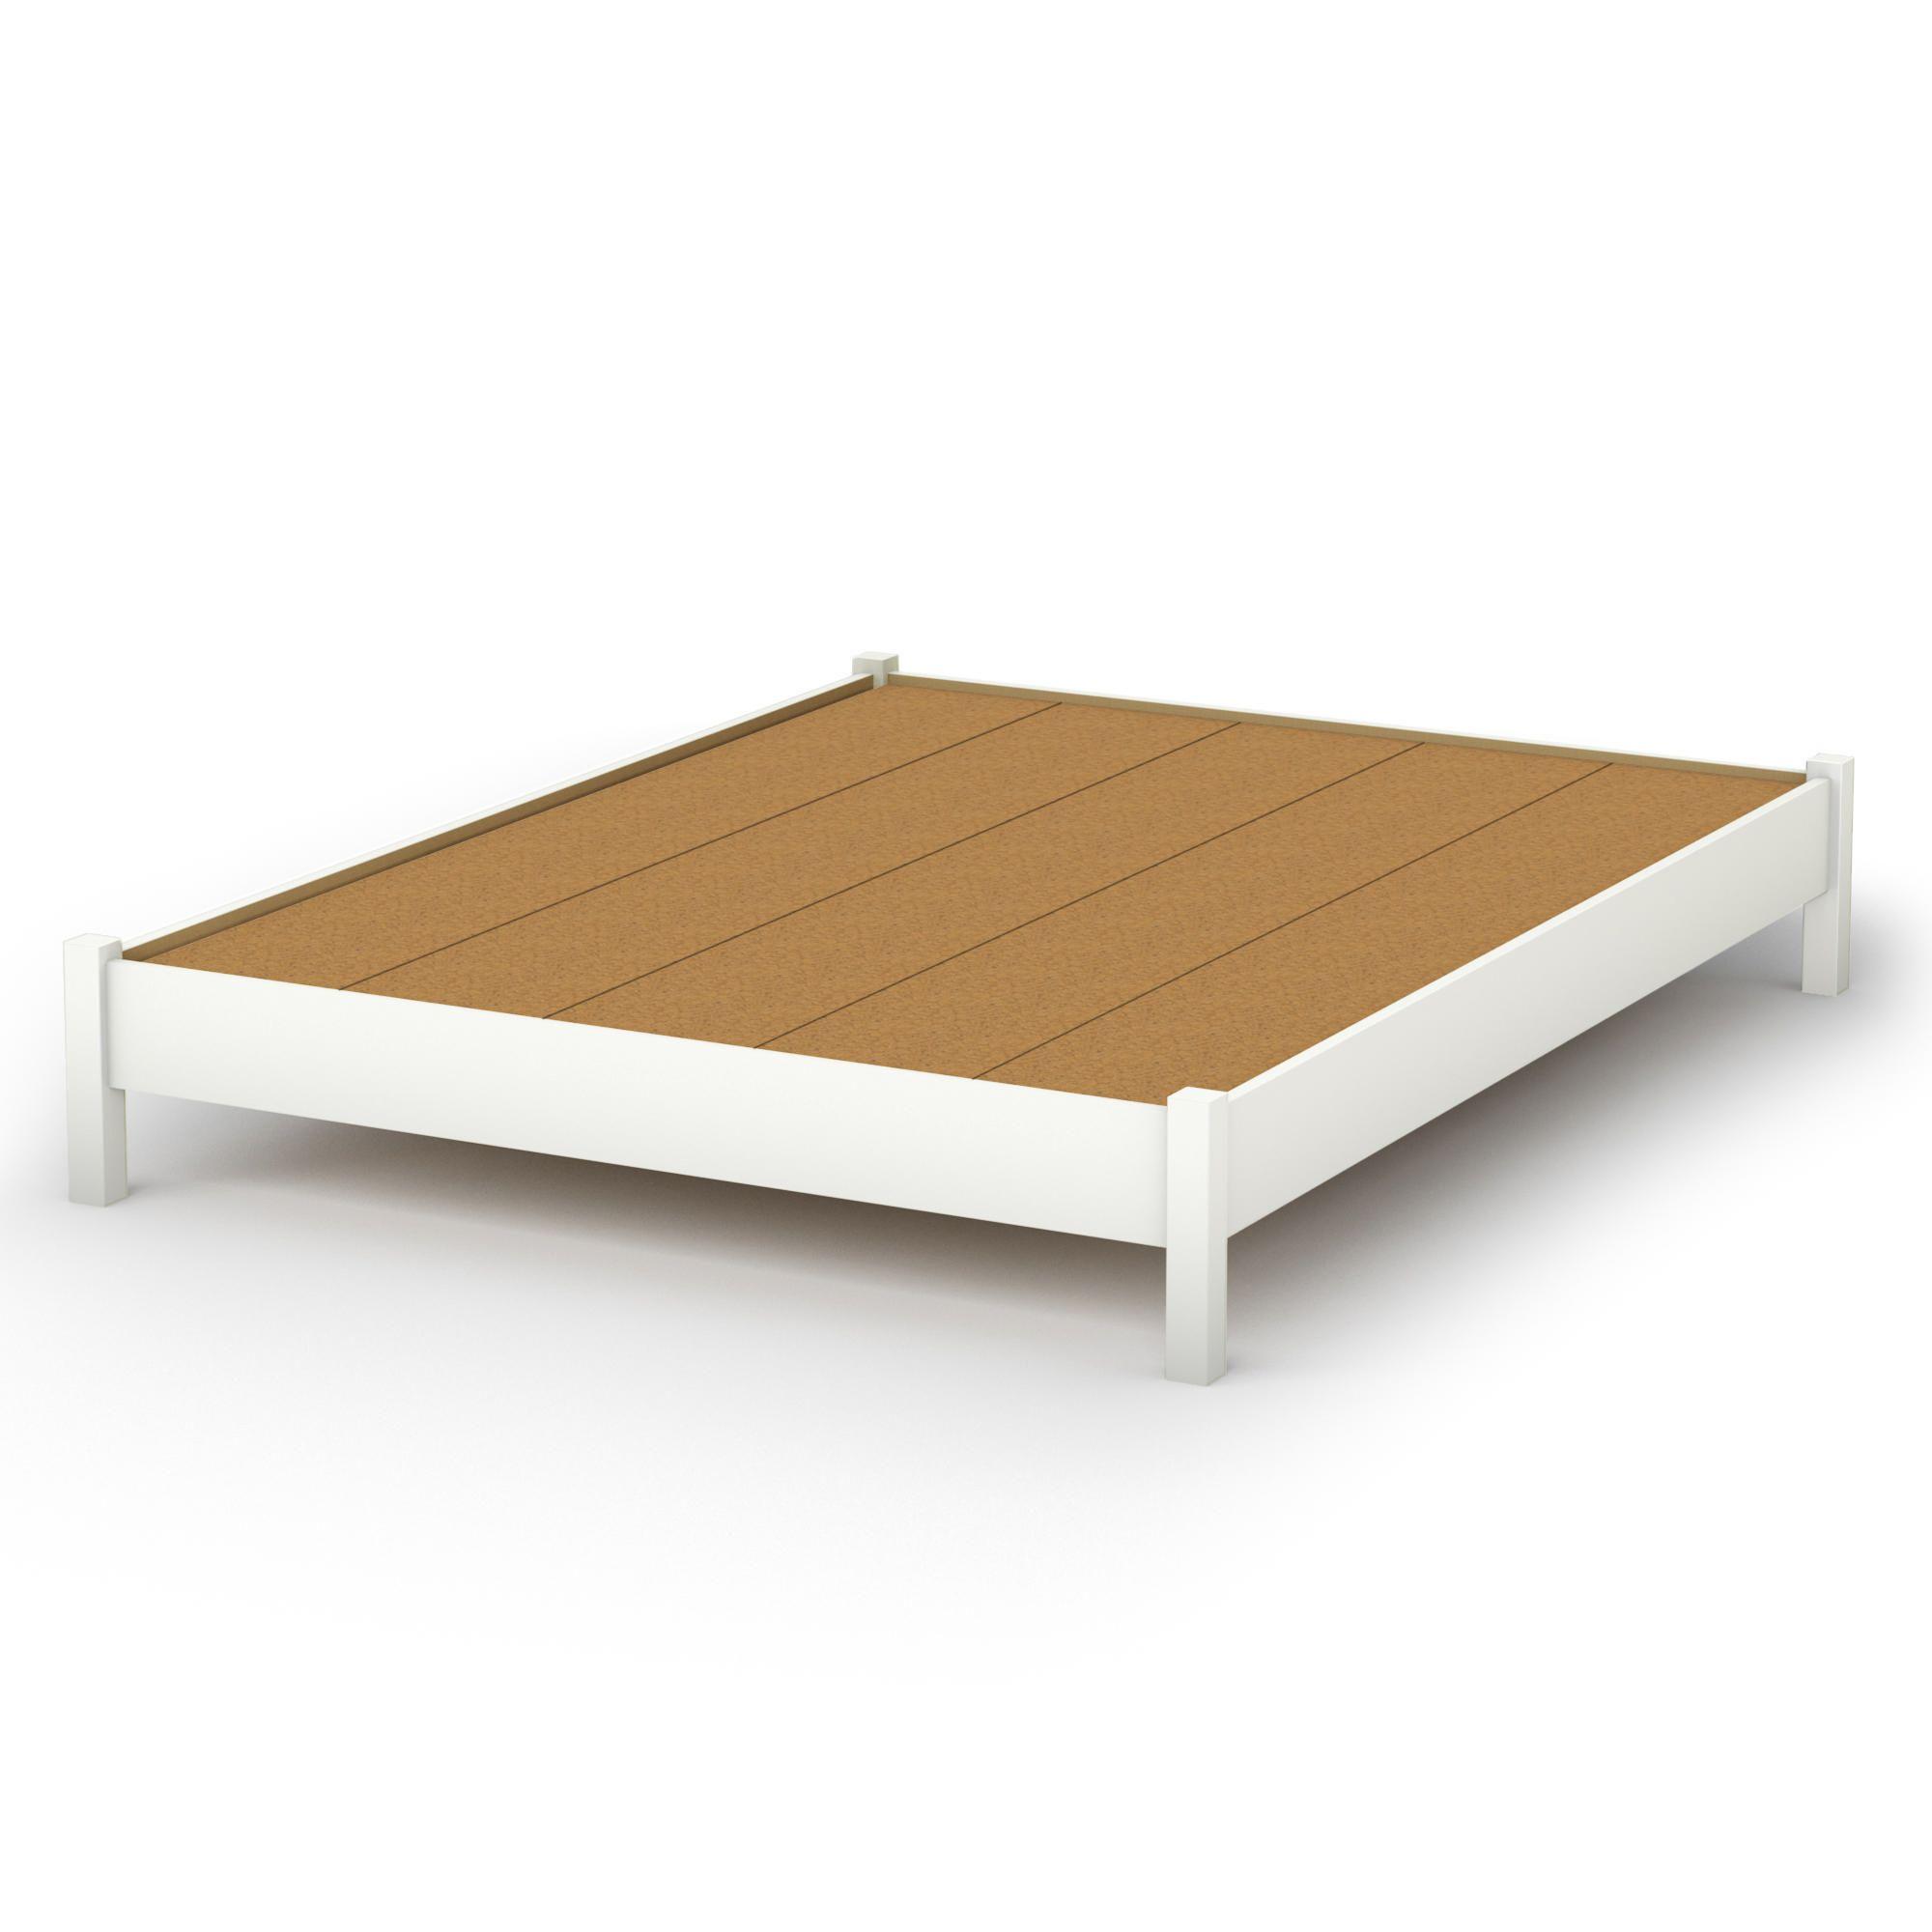 south shore soho collection queen size platform bed  walmartca -